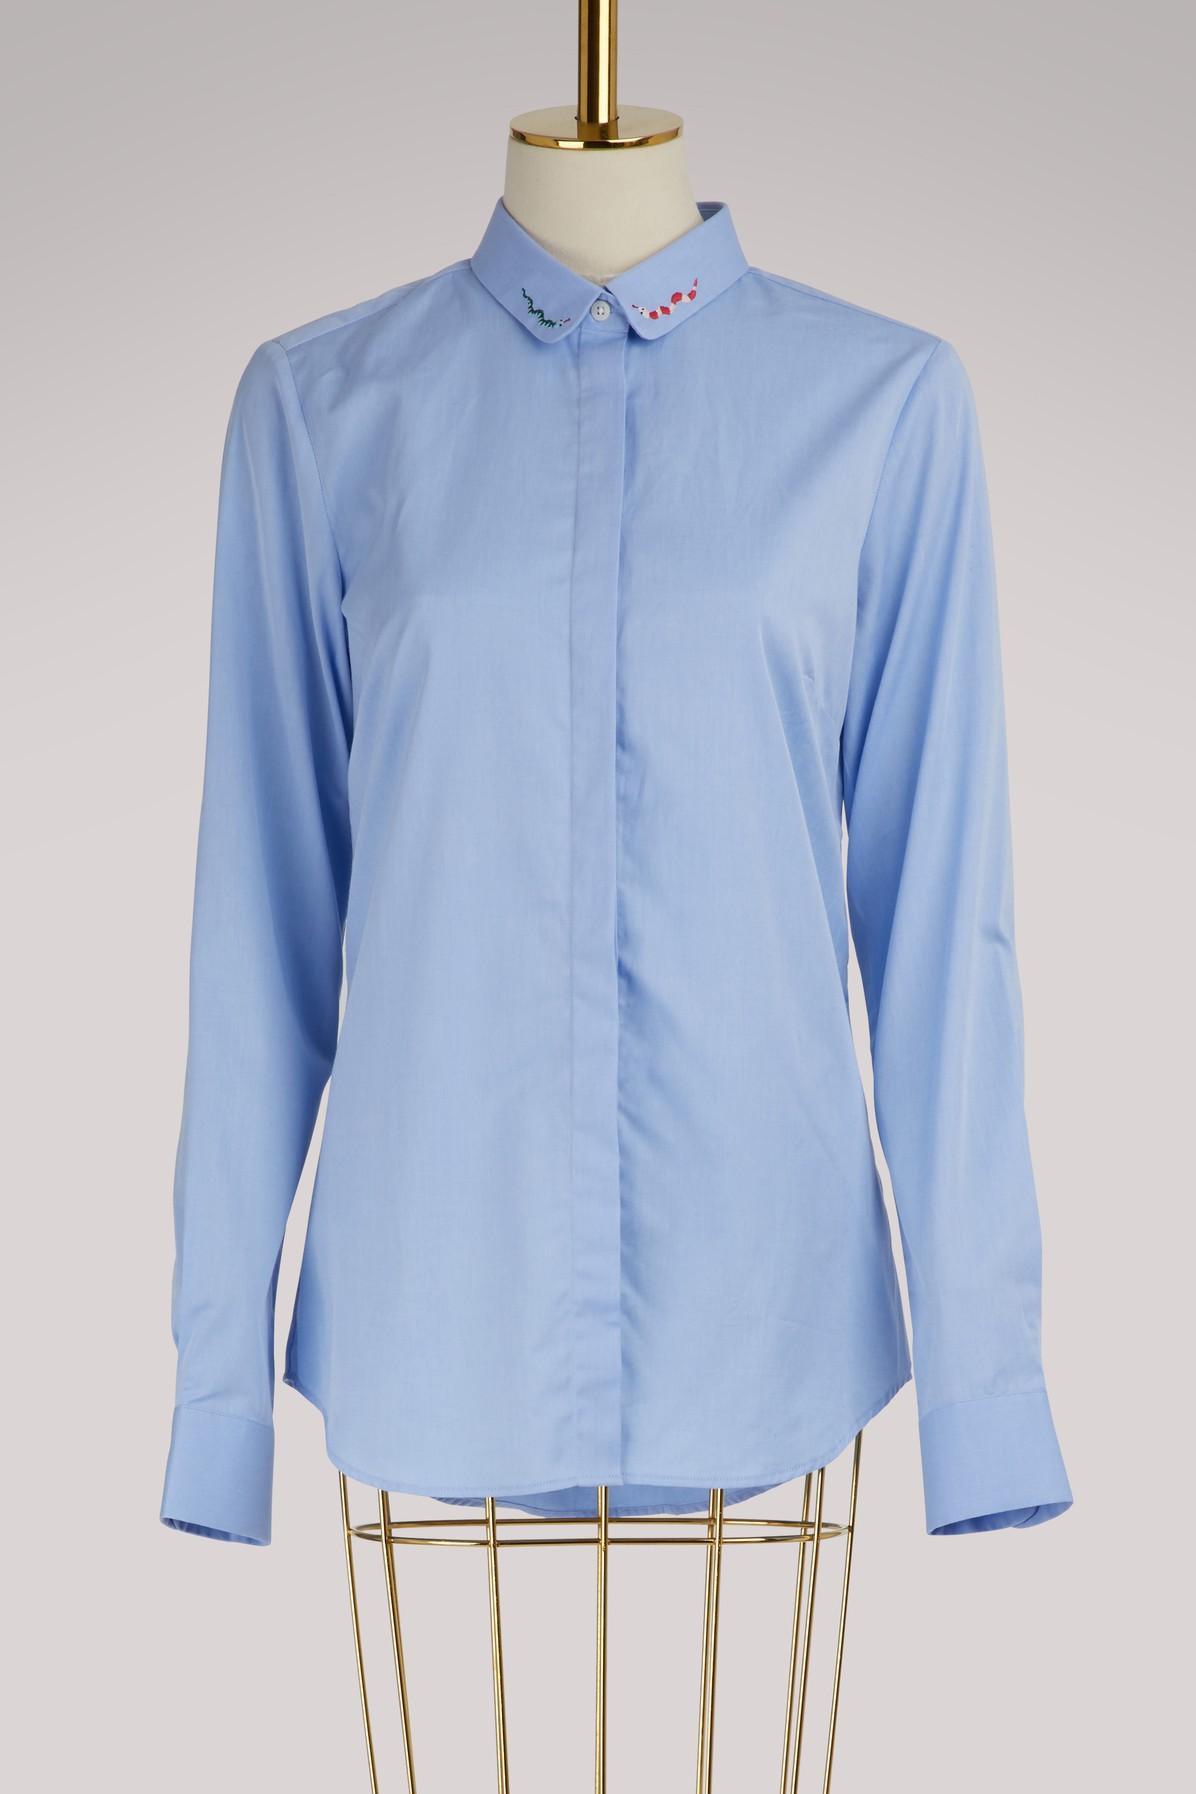 61edd00957d Maison Labiche Snake Cotton Shirt In School Blue